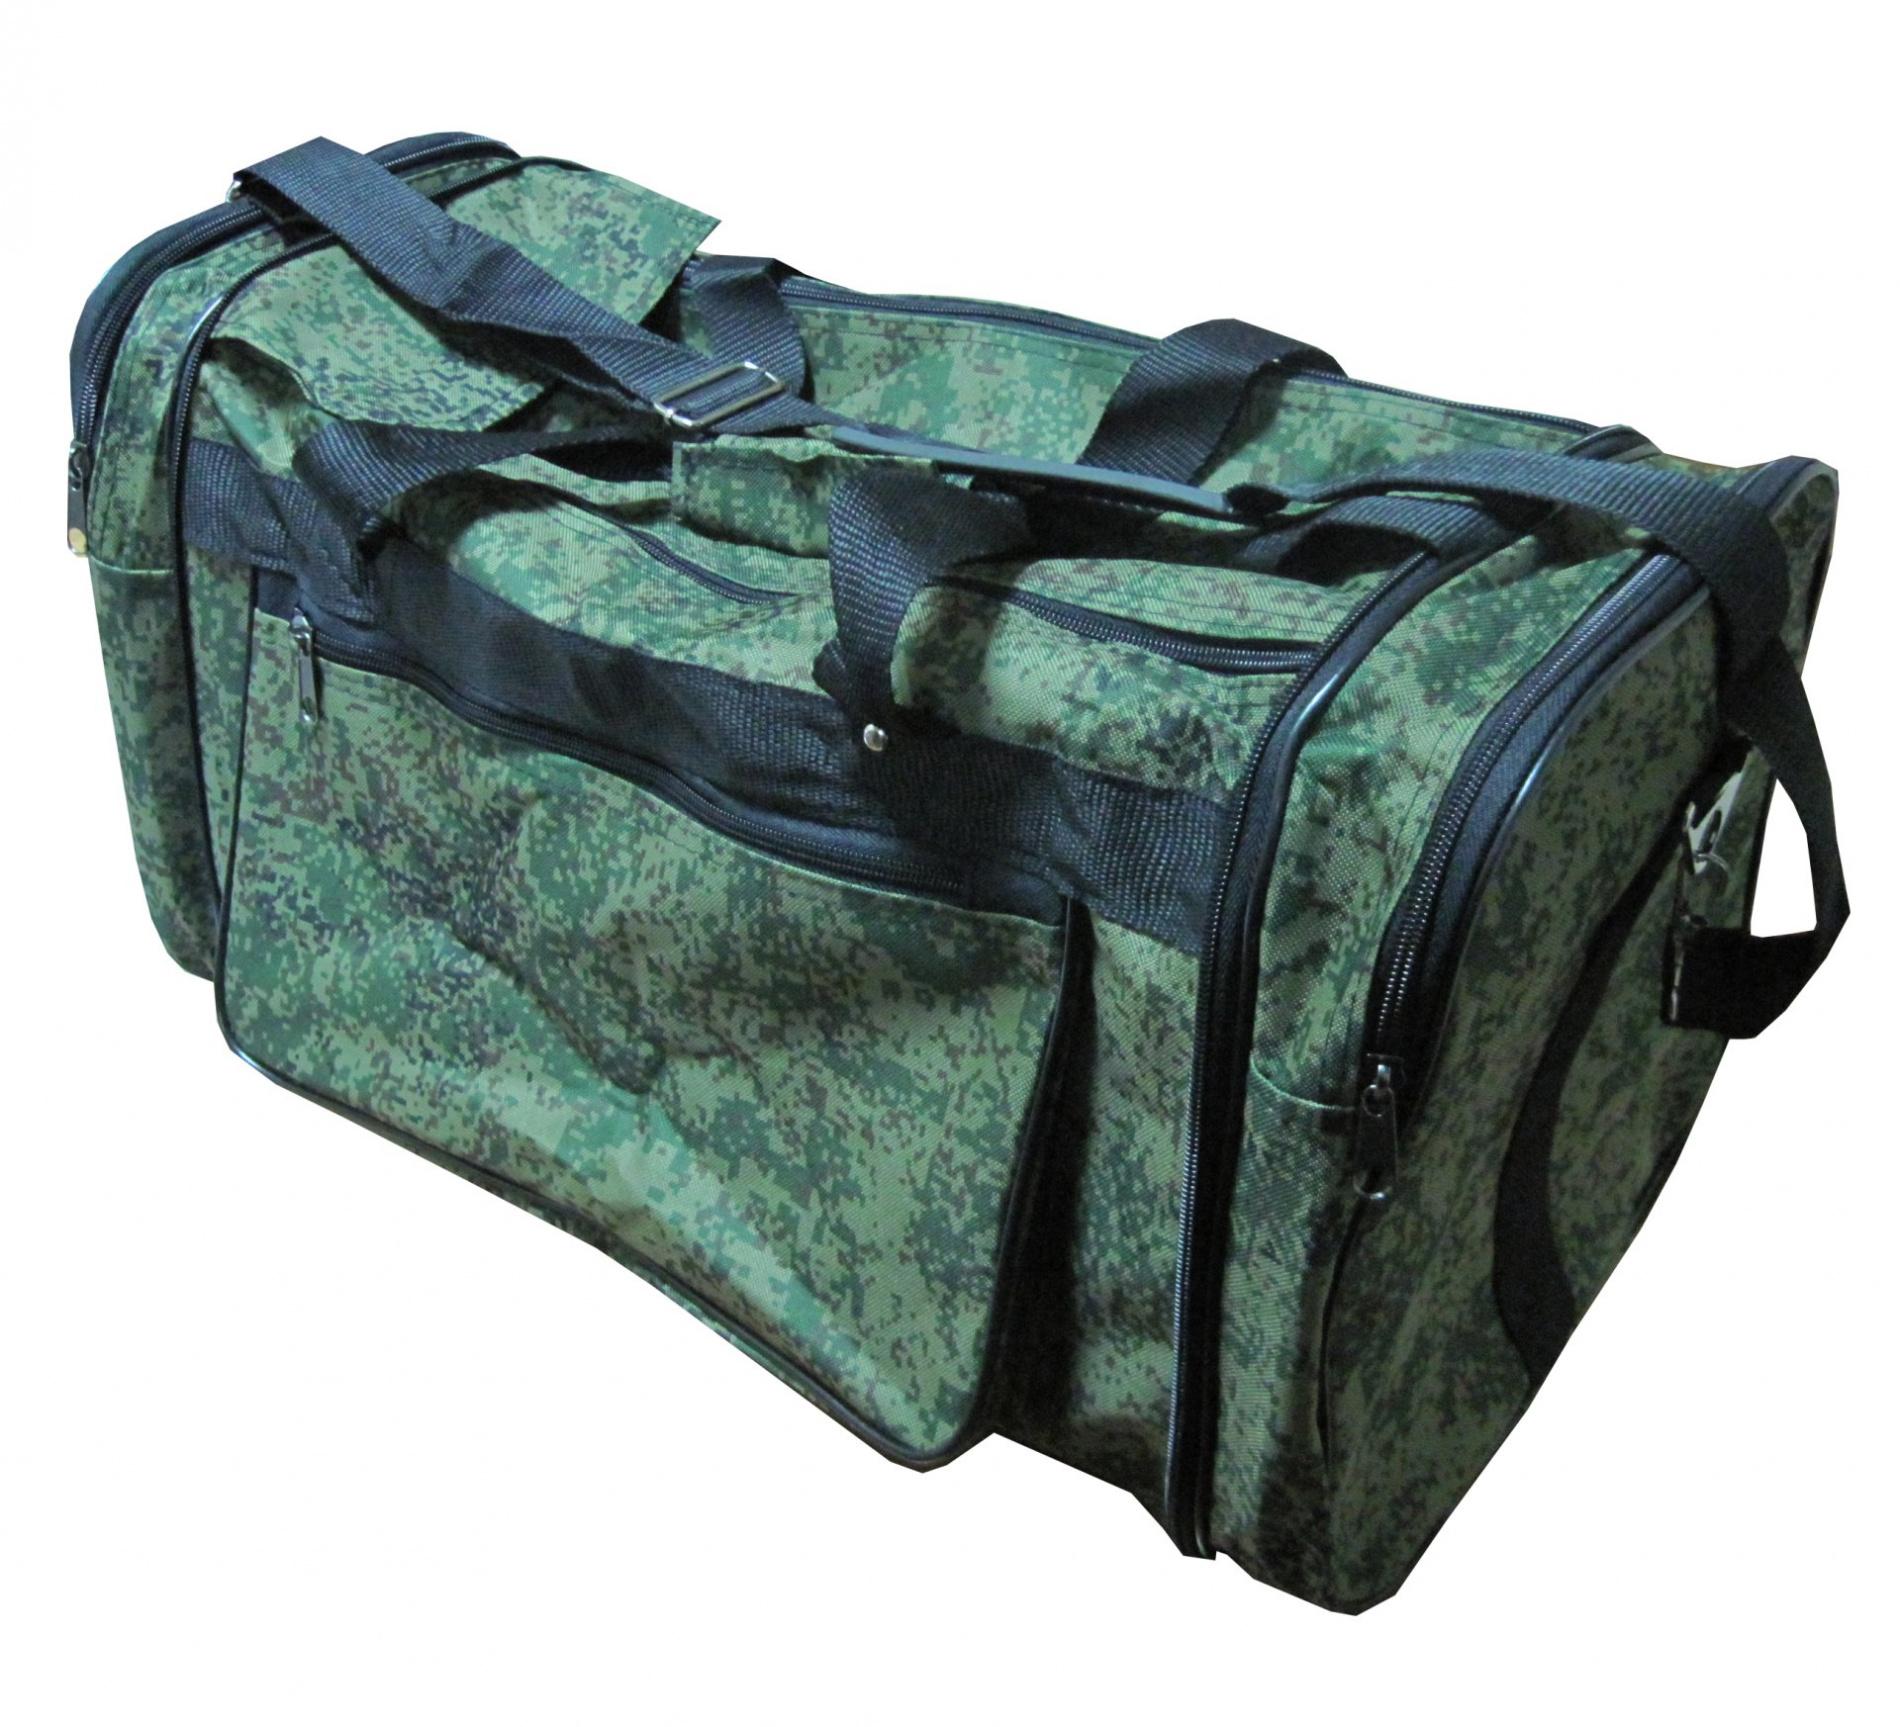 Сумка дорожная средняя (Кострома)Сумки<br>Общие характеристики Тип Дорожная сумка <br>Тип конструкции Мягкий Число лямок 1<br>